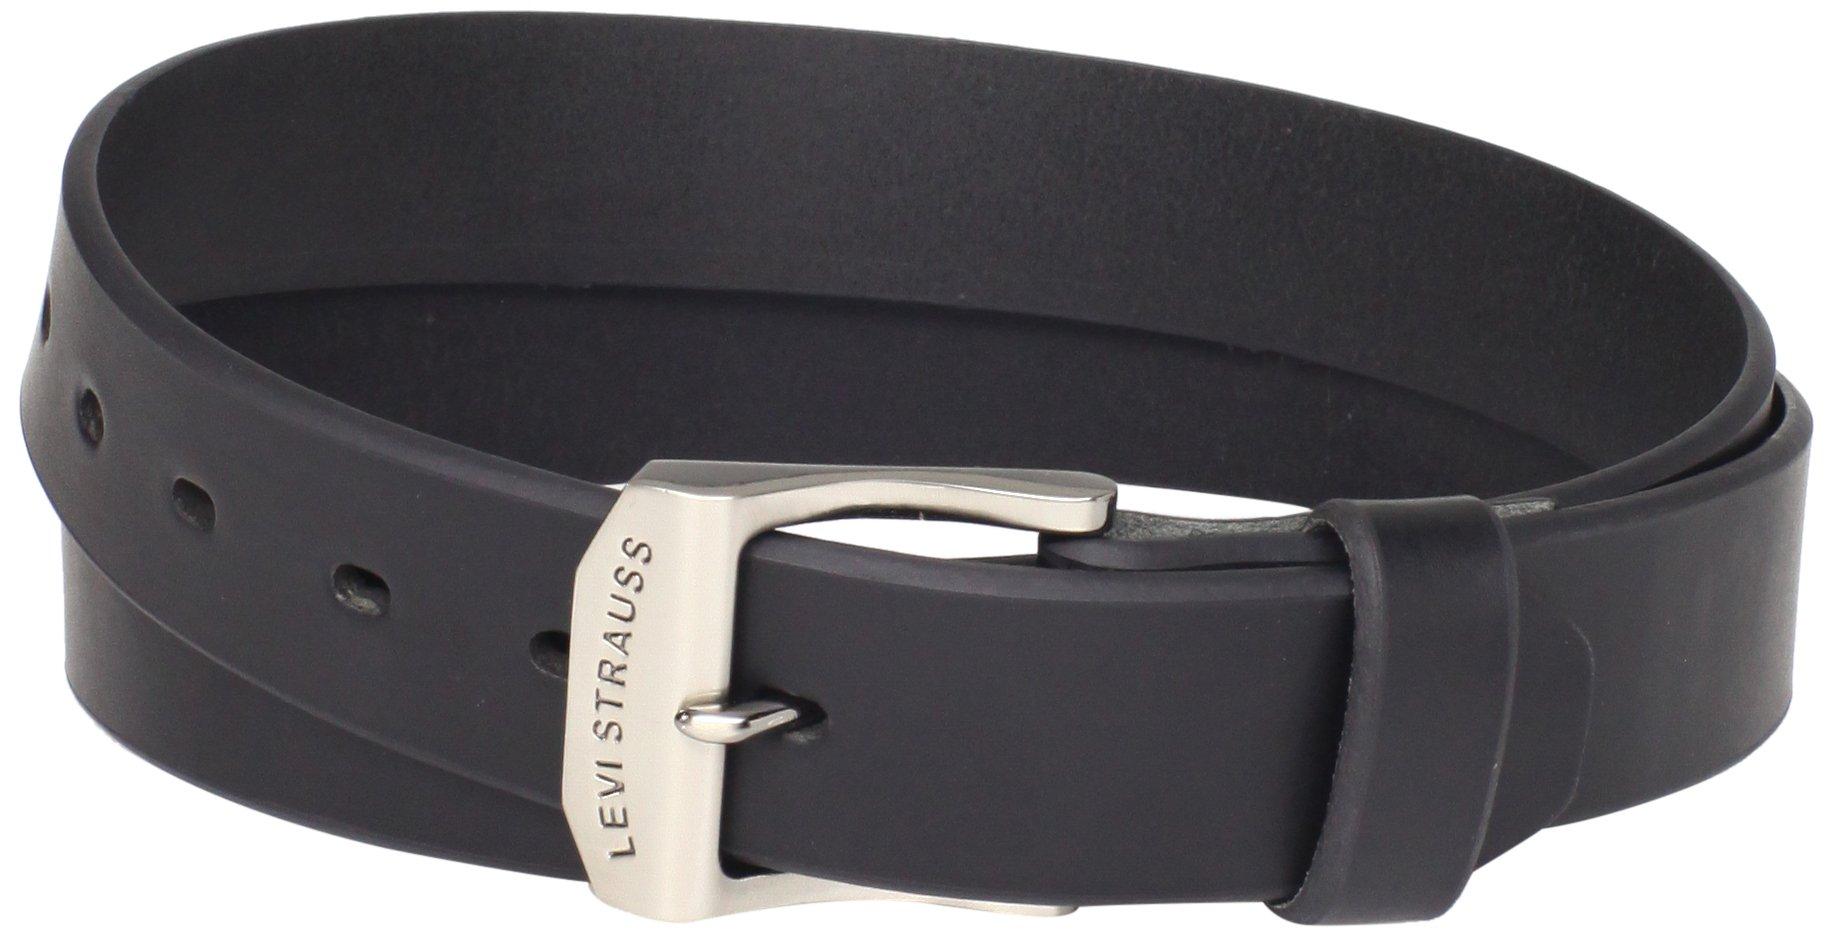 Levi's Men's 38mm Bridle Belt (Regular and Big & Tall Sizes),Black,46